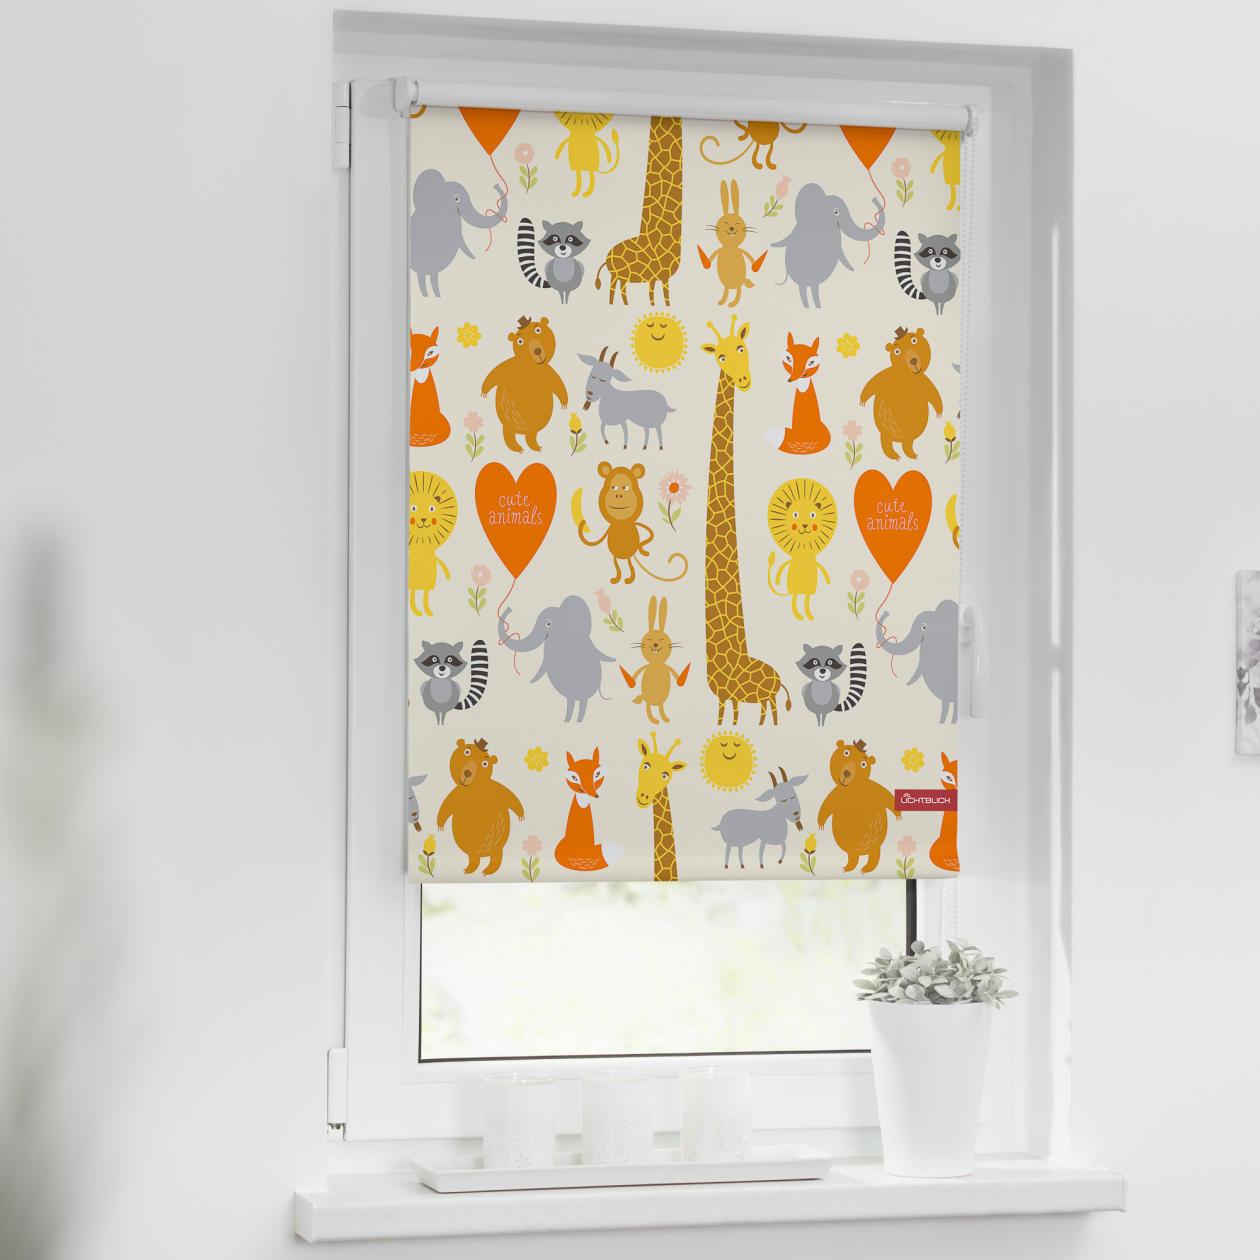 verdunkelungsrollo klemmfix ohne bohren cute animals gelb lichblick shop. Black Bedroom Furniture Sets. Home Design Ideas